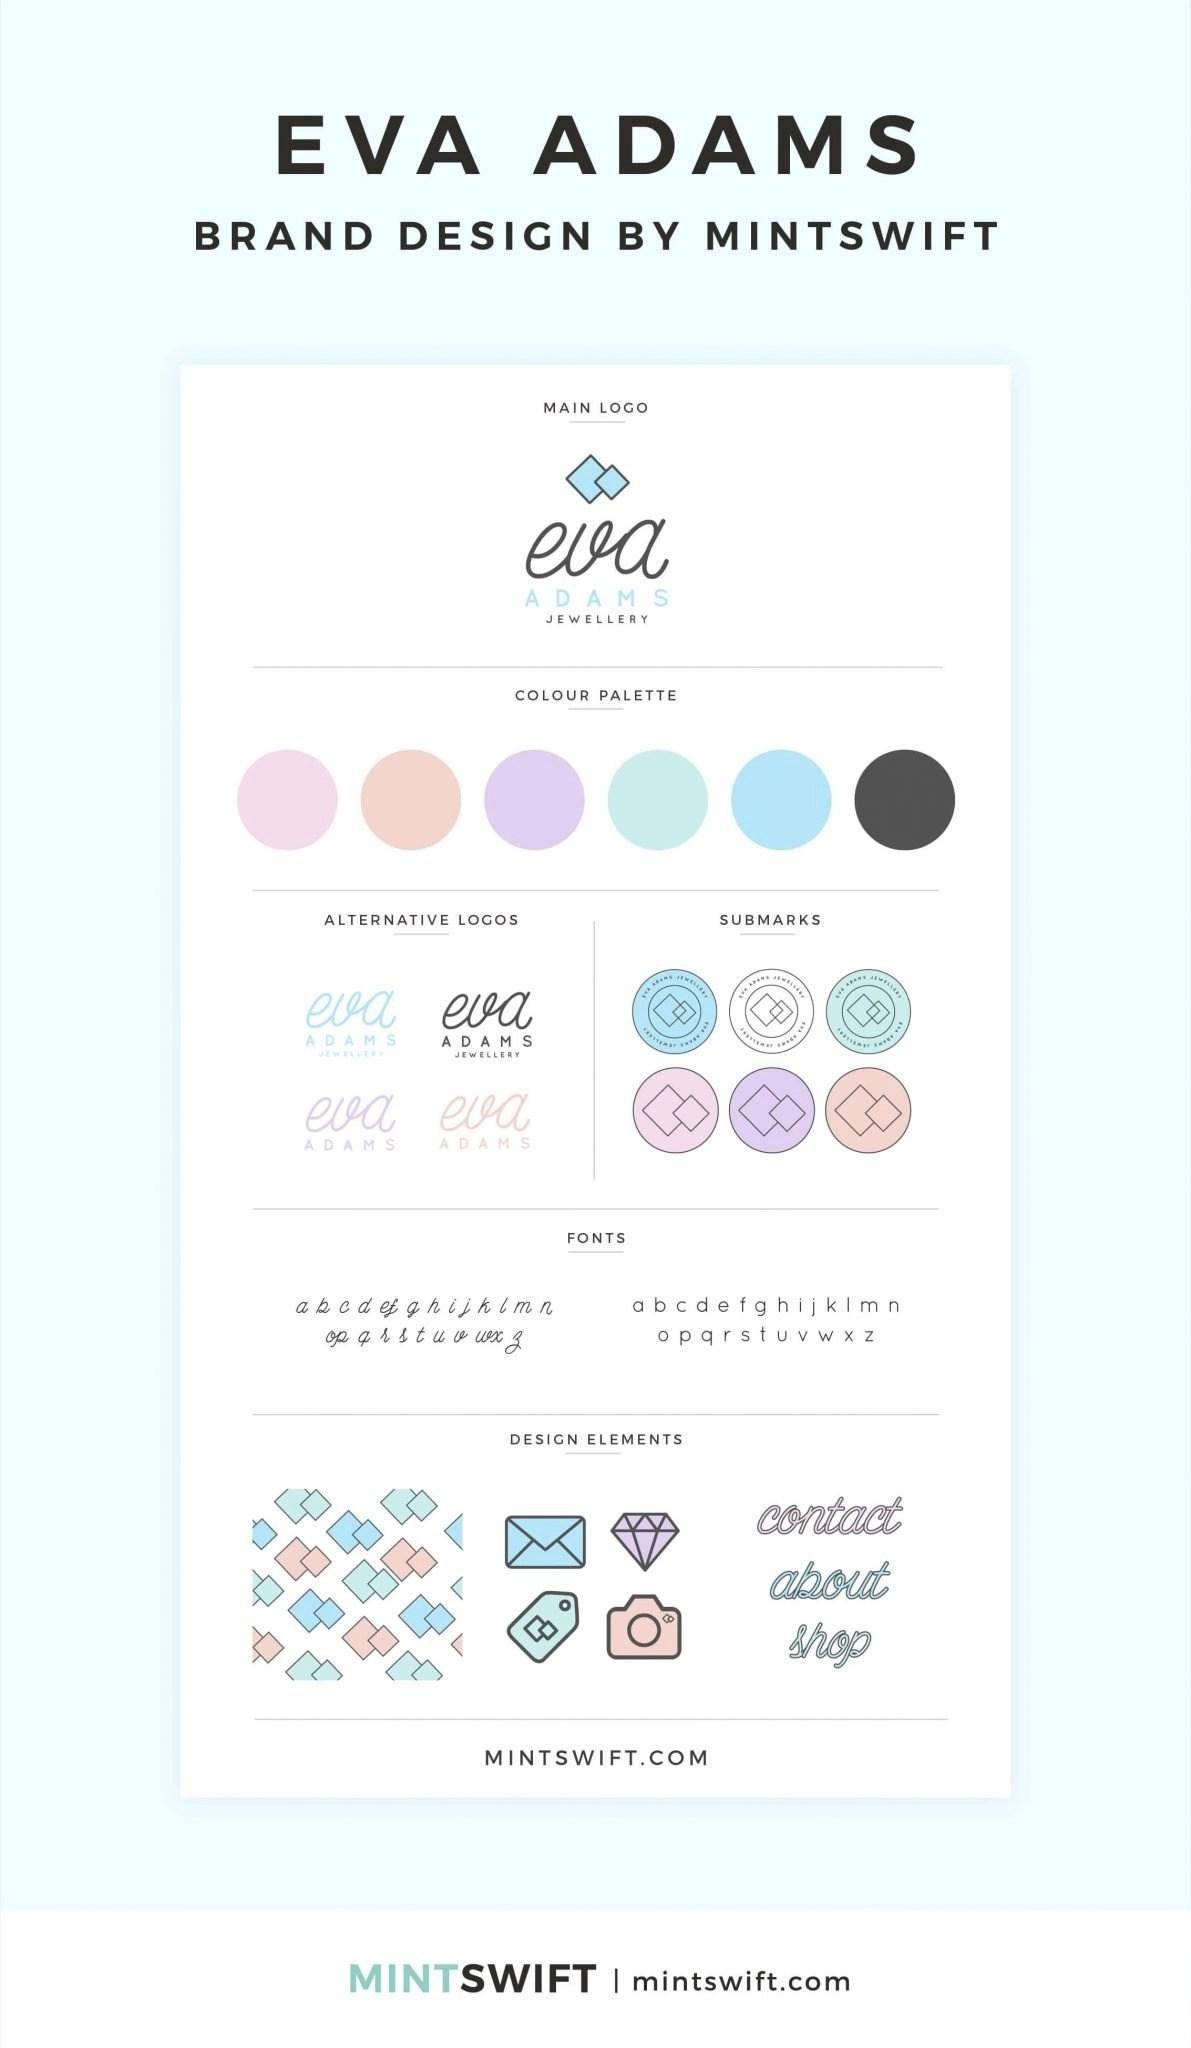 Eva Adams - Brand Design - MintSwift - Adrianna Leszczynska